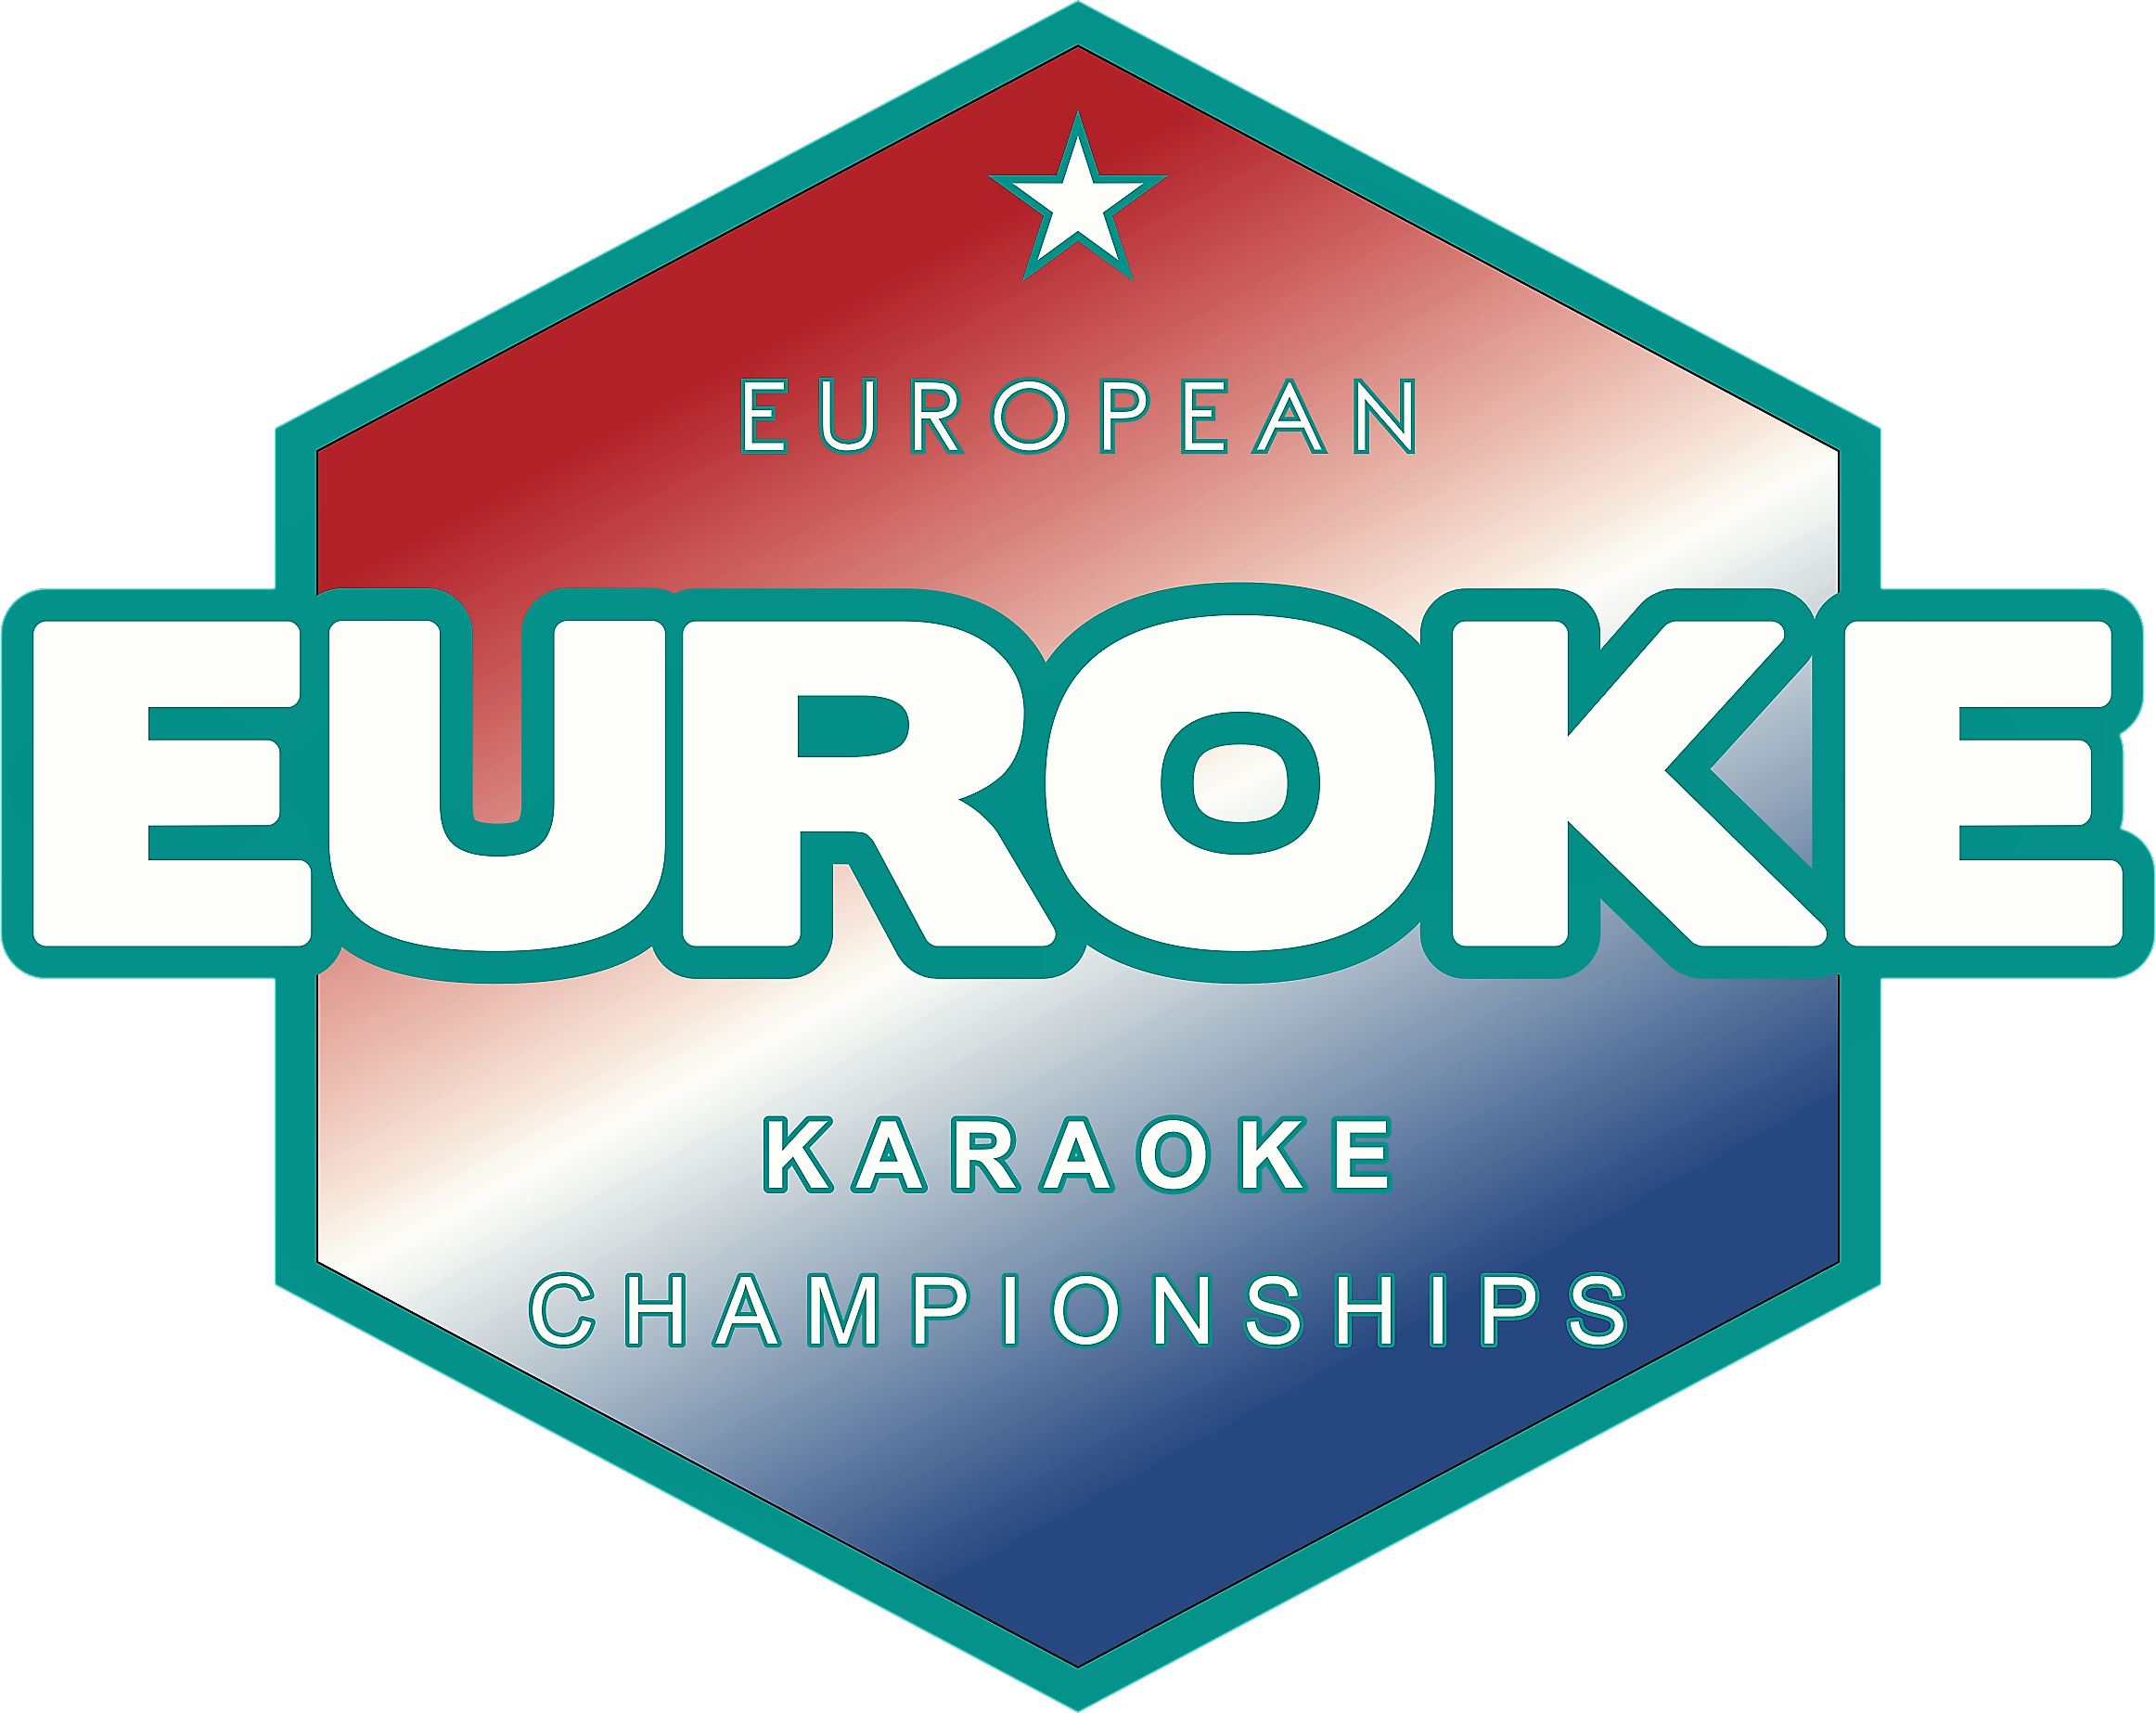 Euroke logo